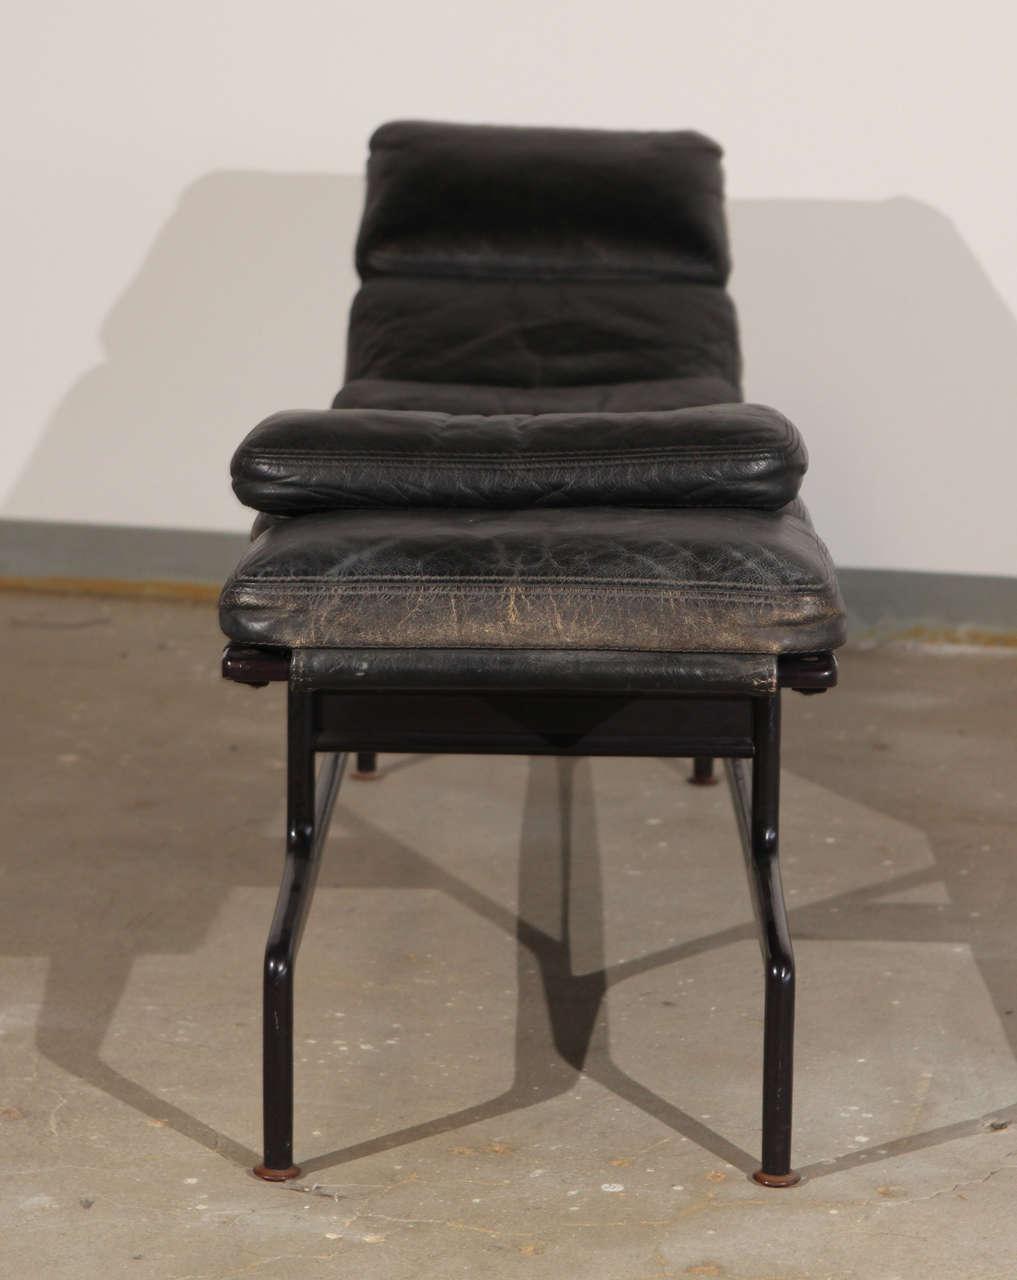 es 106 eames chaise lounge at 1stdibs. Black Bedroom Furniture Sets. Home Design Ideas